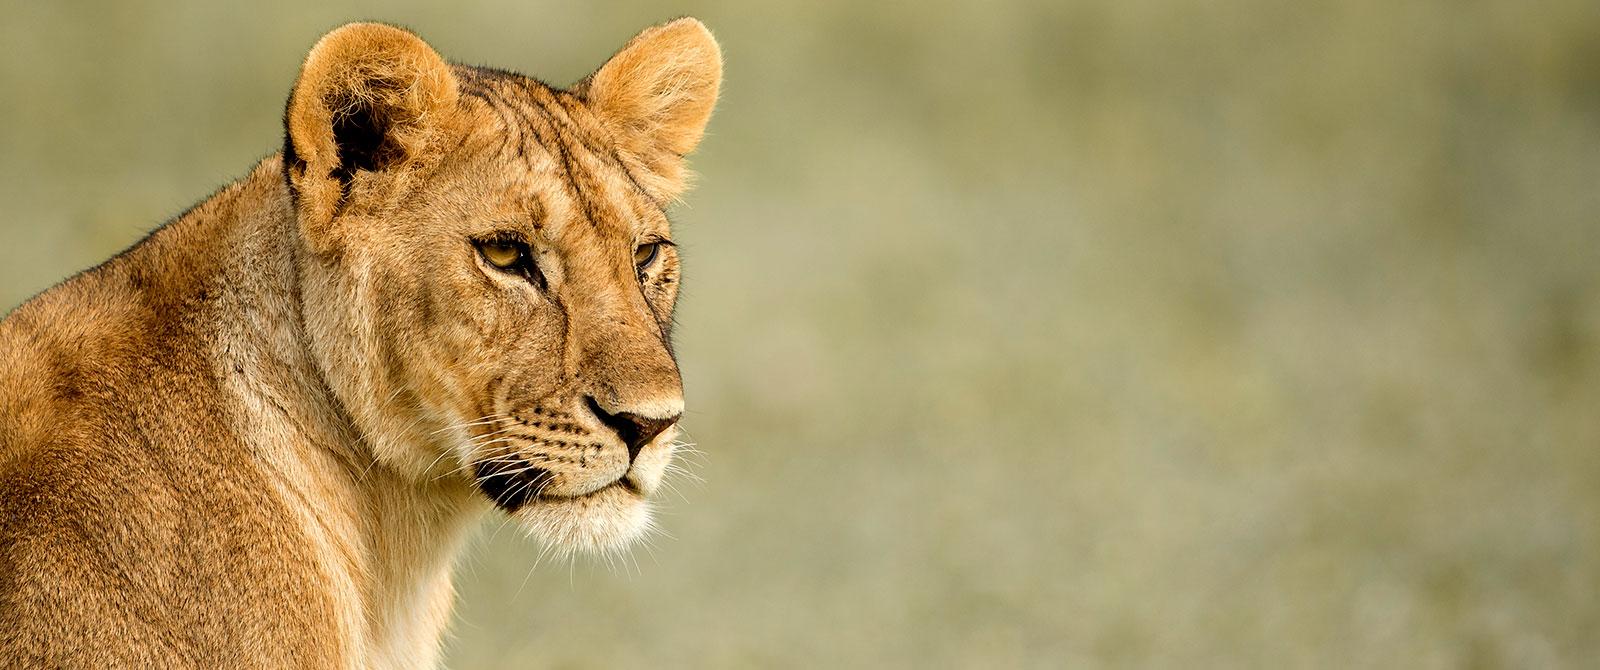 Singita Faru Faru Lodge - Lioness on a Serengeti Great Migration Safari - Tanzania Highlights: Tarangire, Ngorongoro, and Serengeti Safari